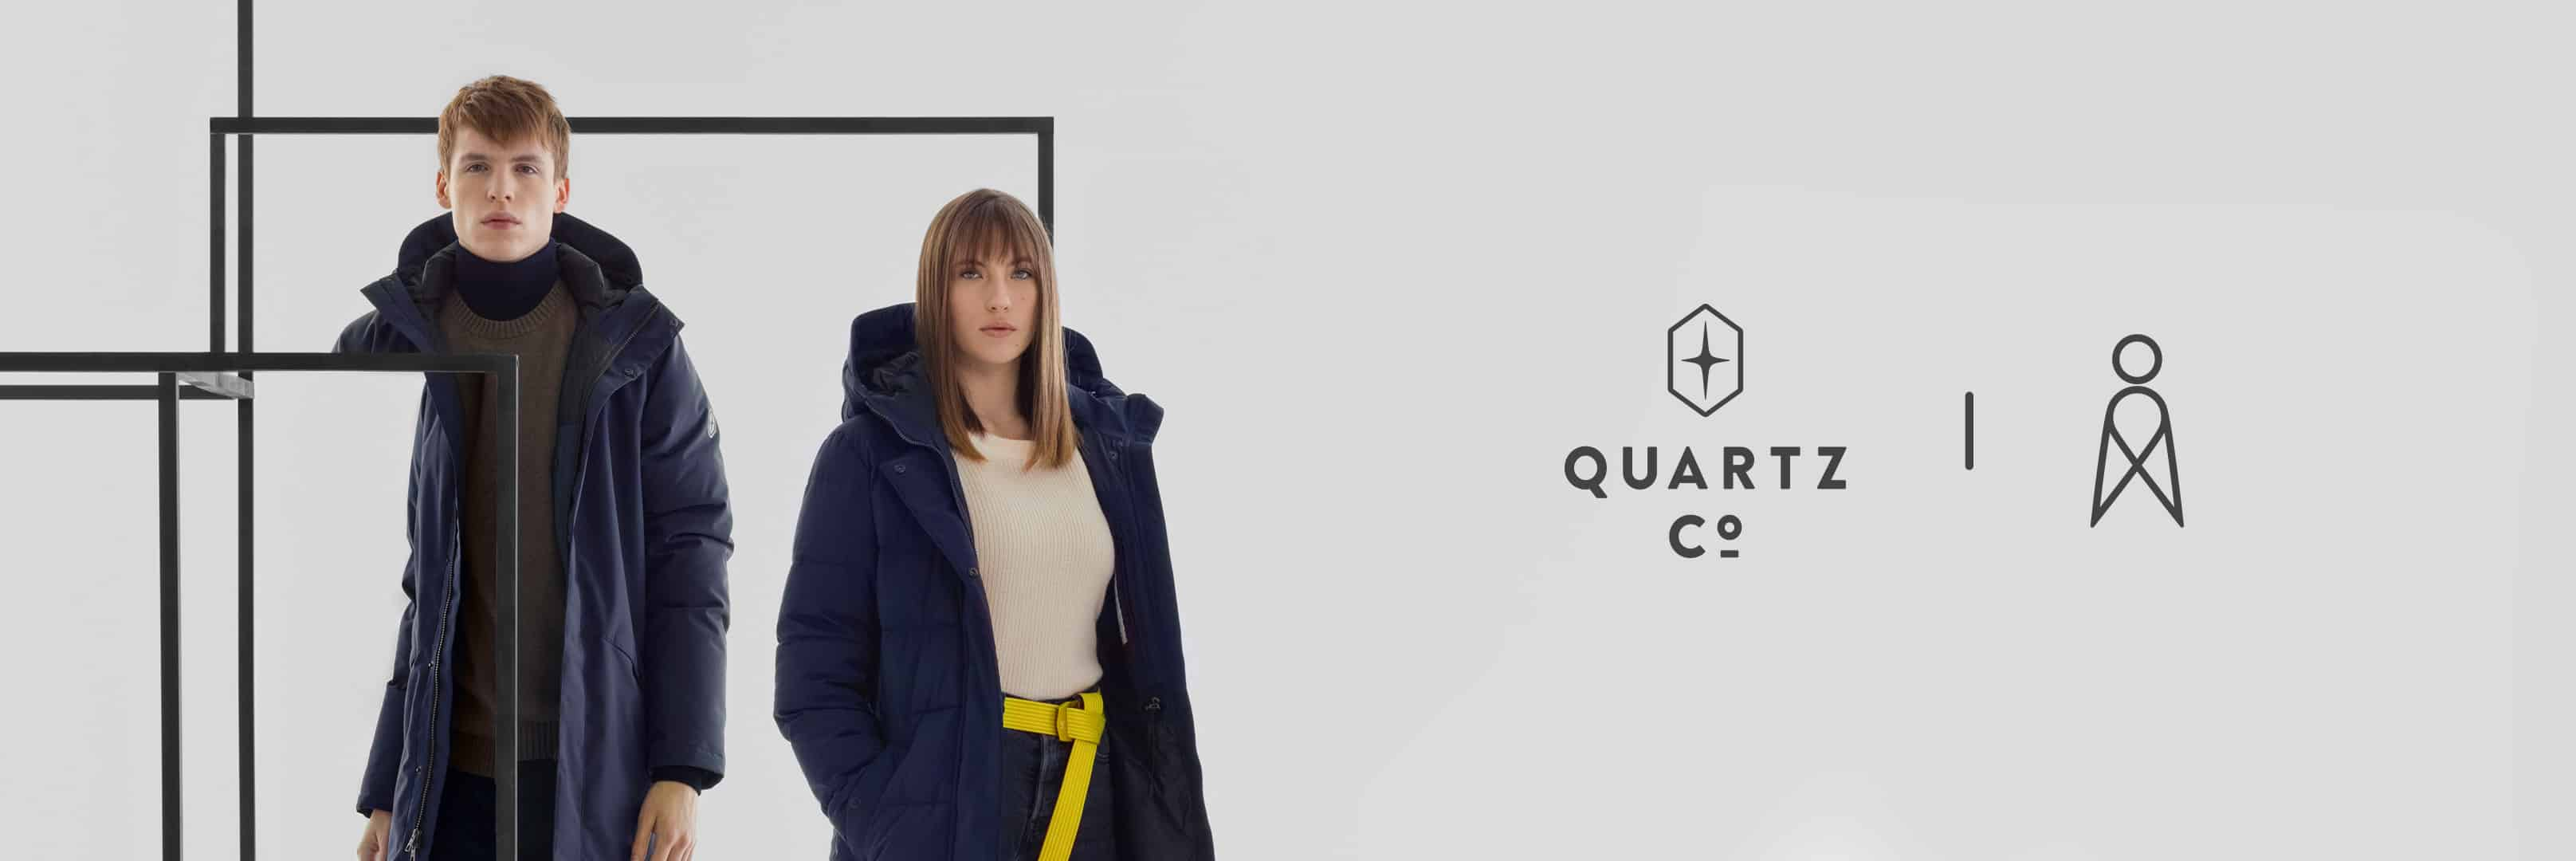 Quartz Co.. Altitude Sports x Quartz Co.   Meet Jane & Clark